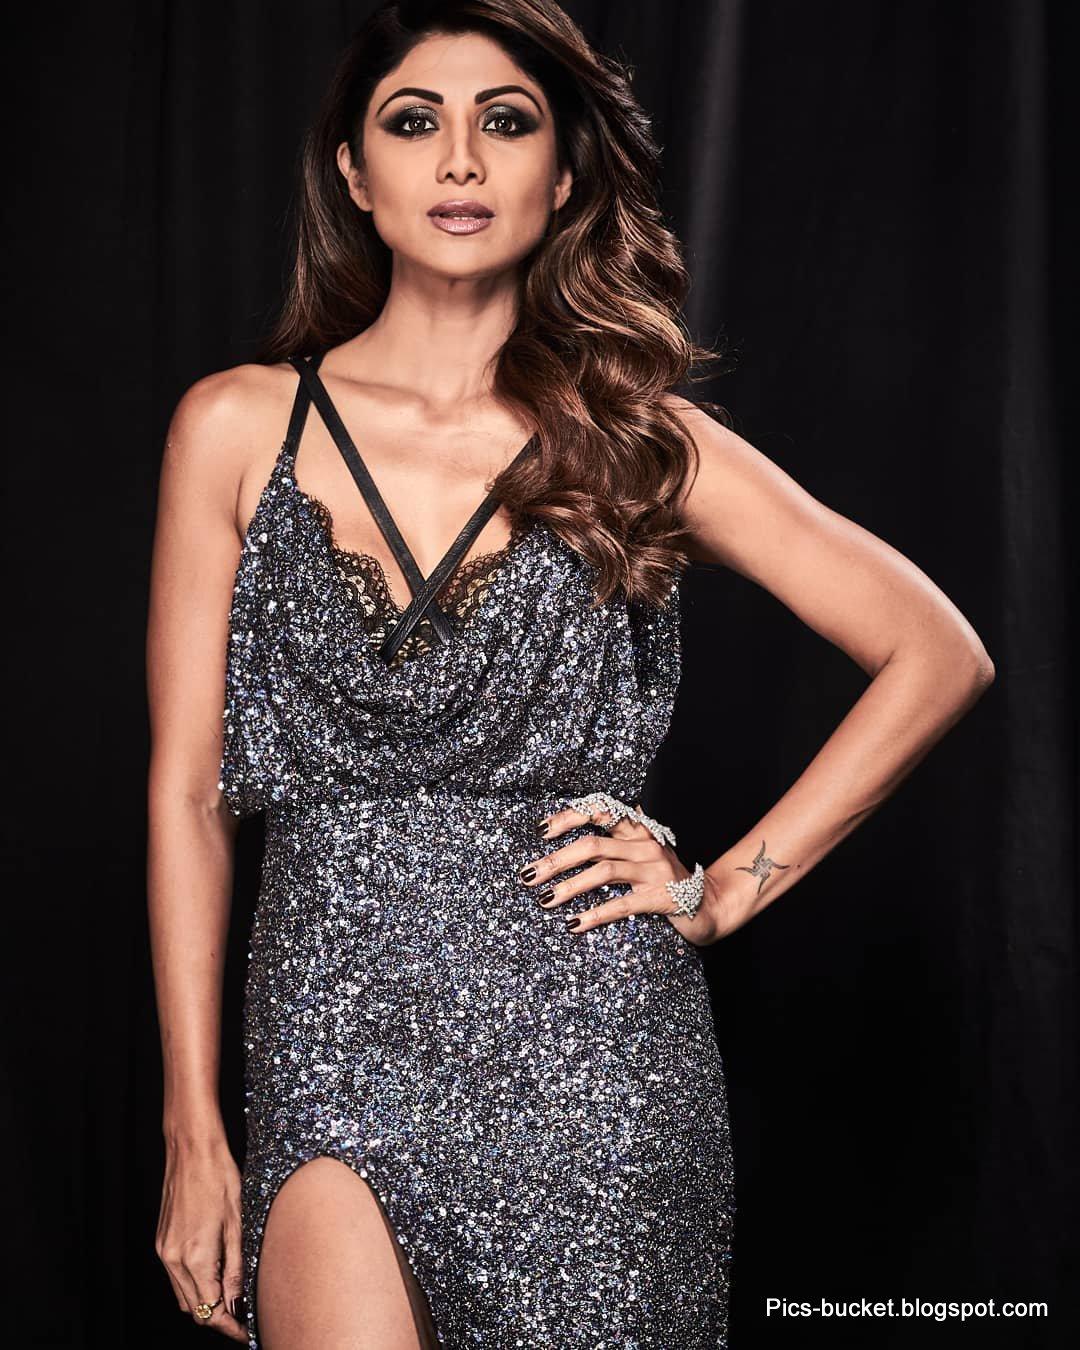 bikini hd pics of bollywood actress